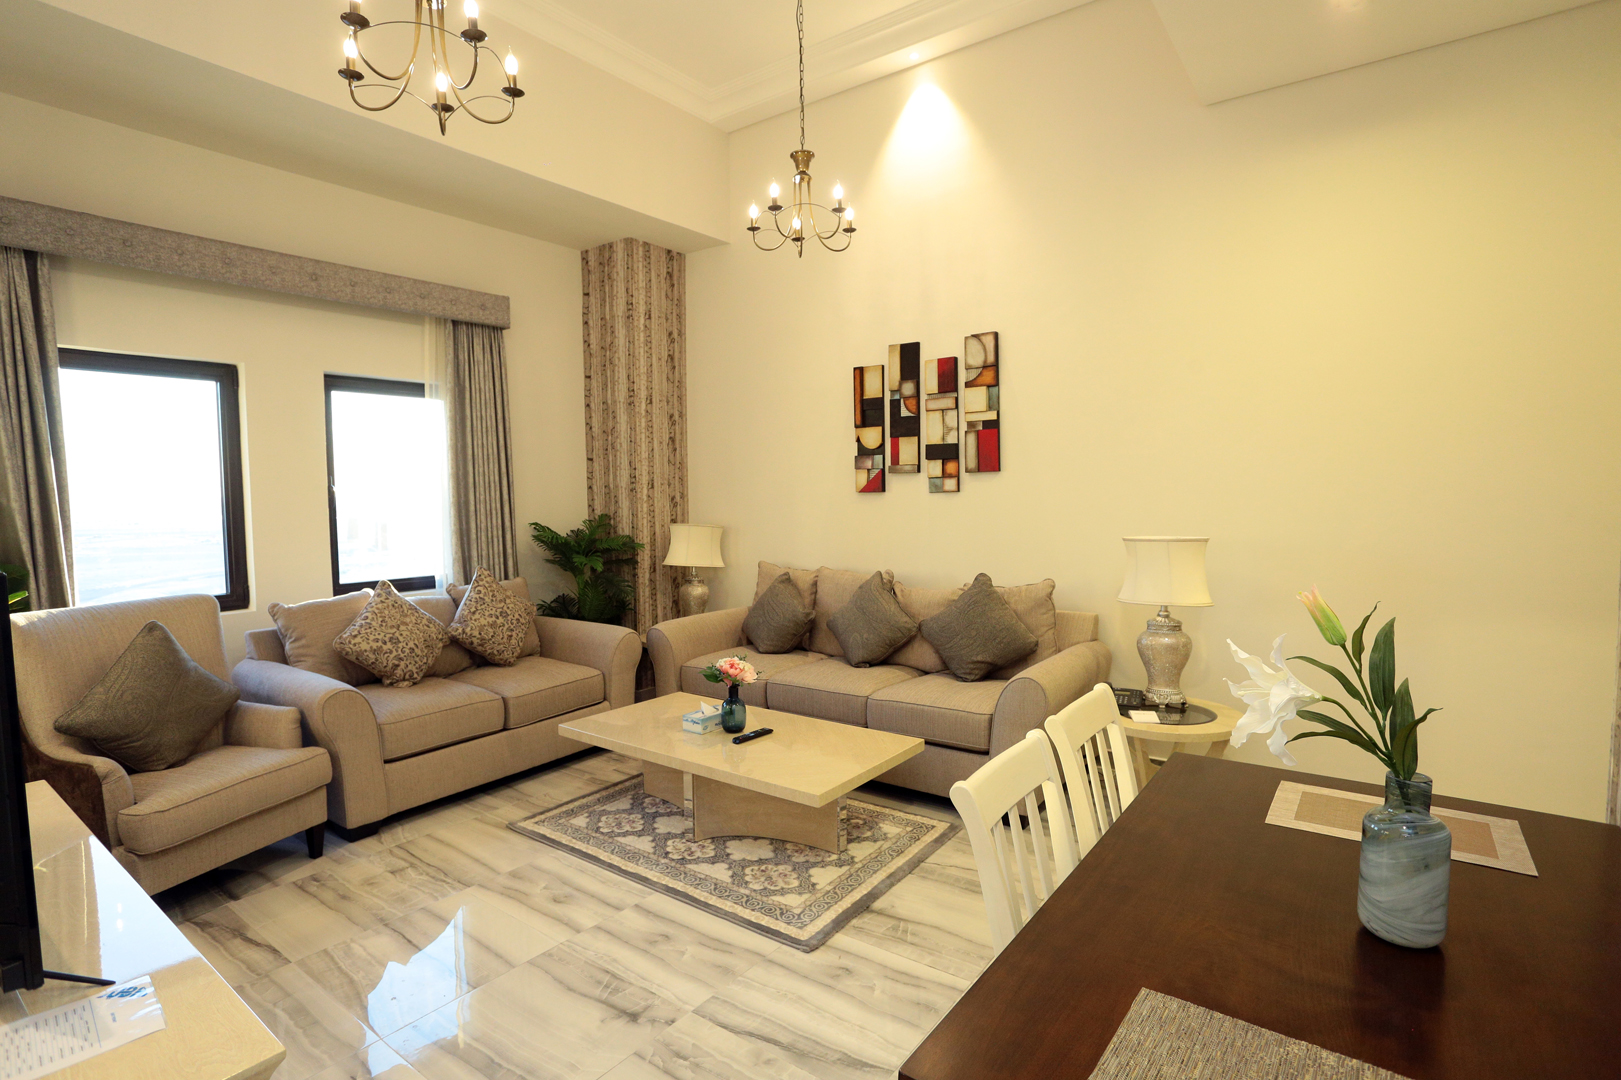 Apartment Marbella Luxury 2 bedrooms photo 27263085